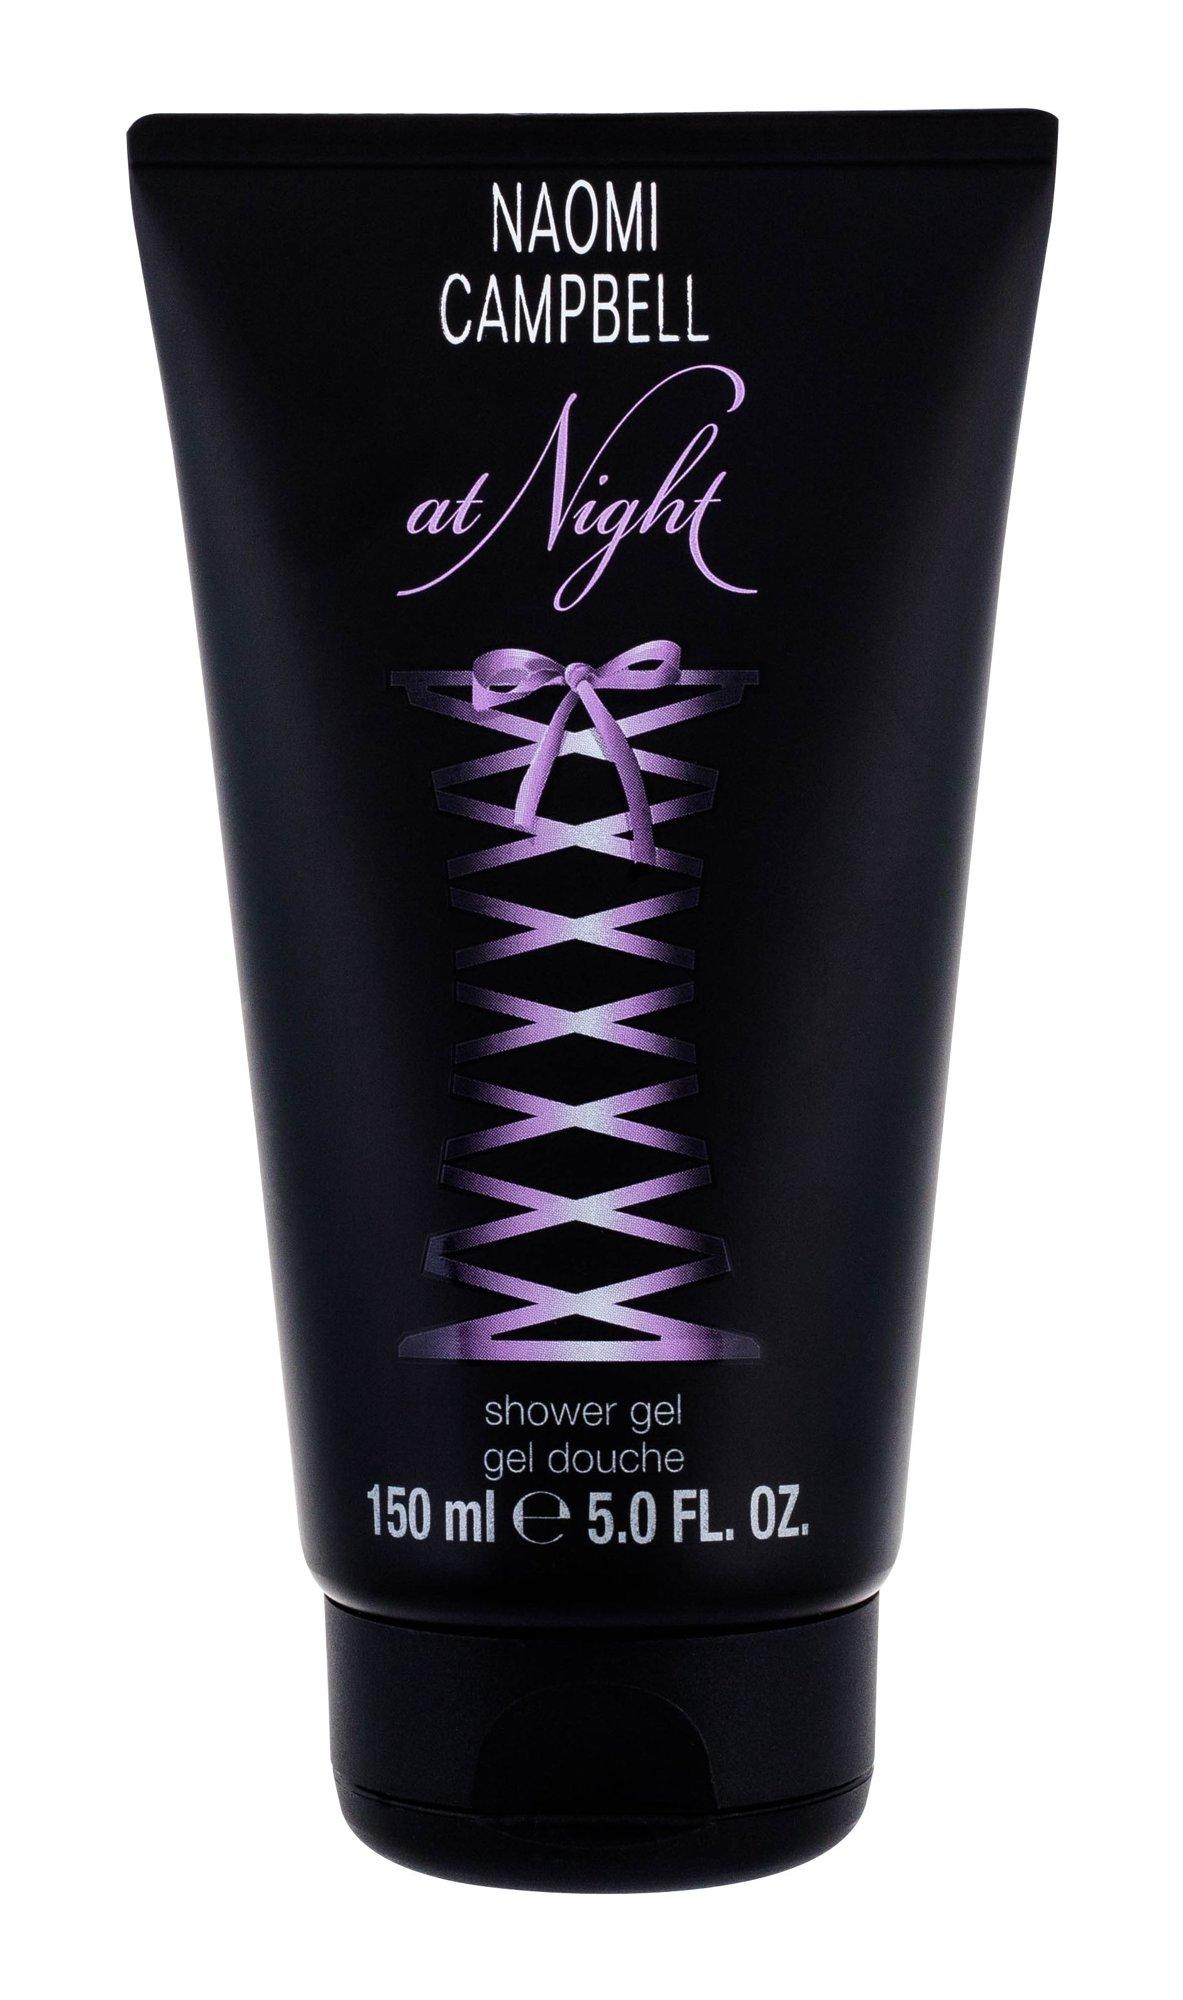 Naomi Campbell Naomi Campbell At Night Shower Gel 150ml